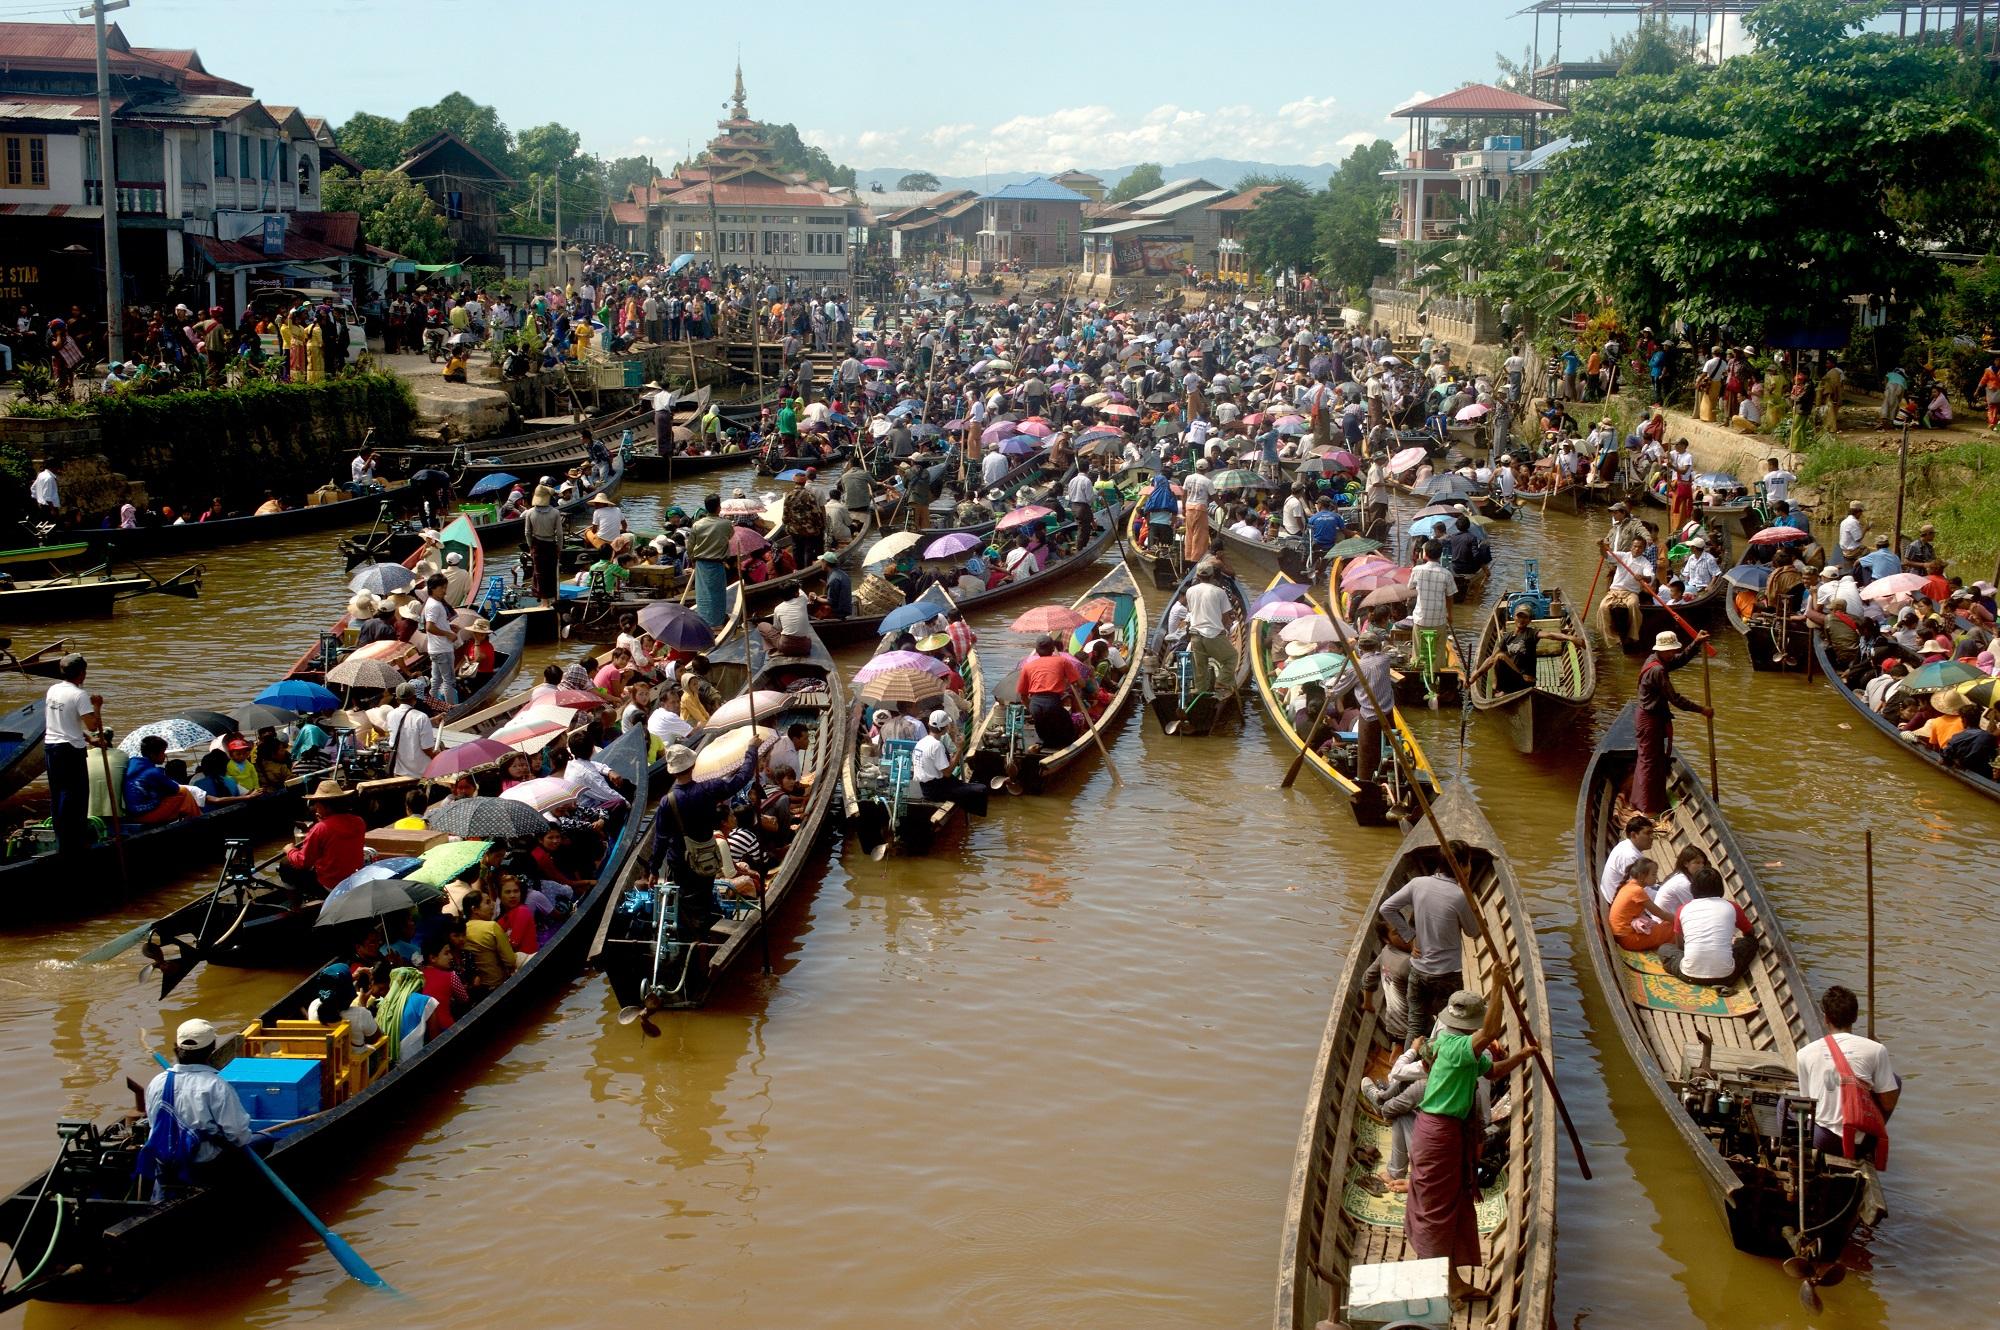 Traffic jam in Phaung Daw Oo Pagoda festival,Myanmar. Photo: Manit Larpluechai/123RF